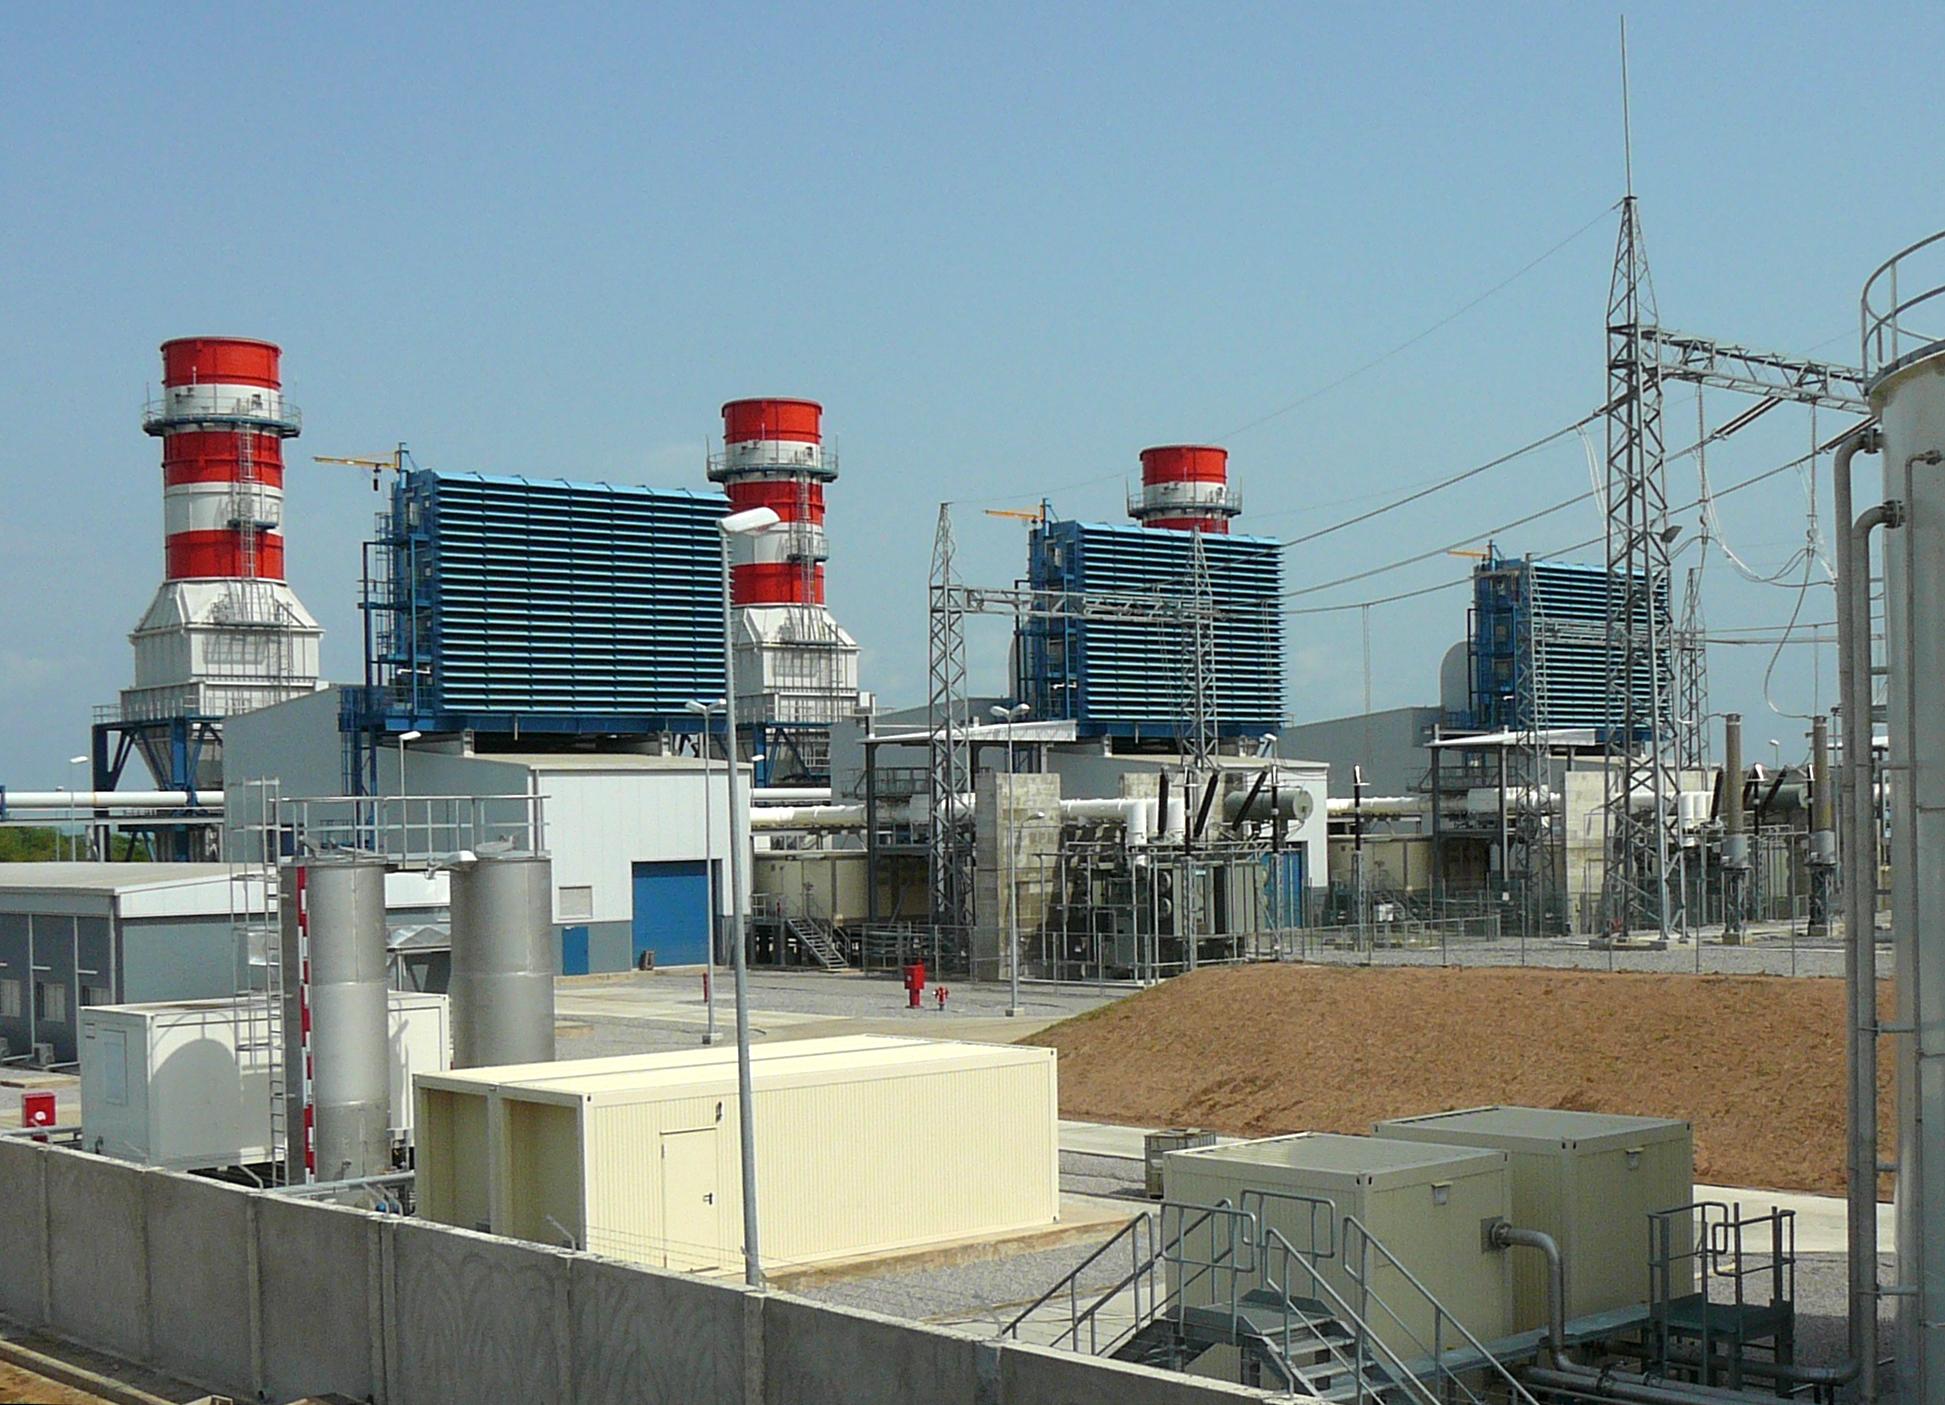 Bayelsa to acquire 100mw gas turbine